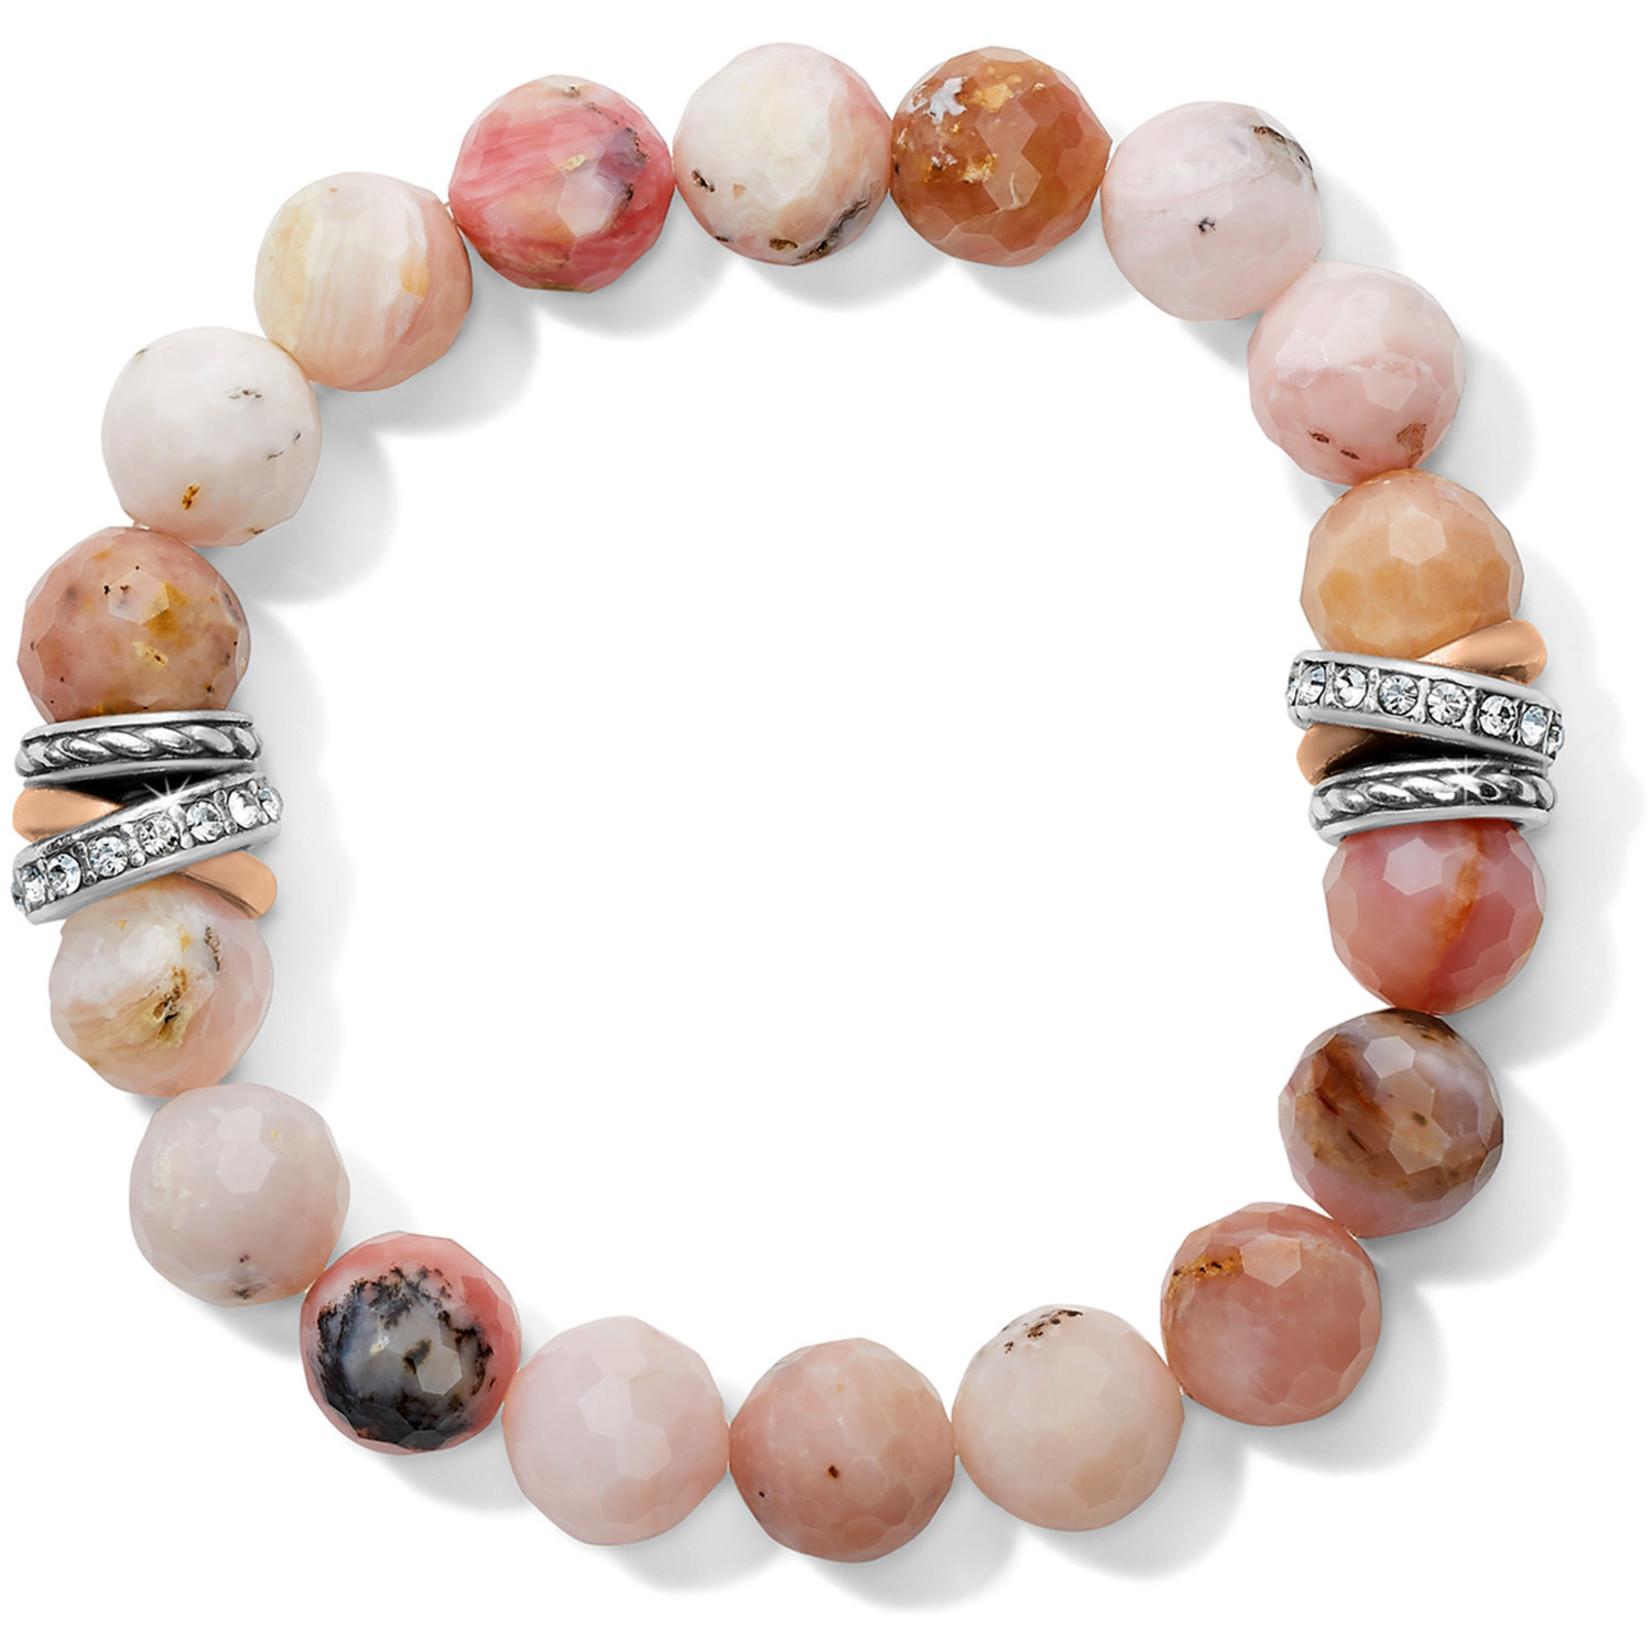 Brighton Neptune's Rings Pink Opal Stretch Bracelet